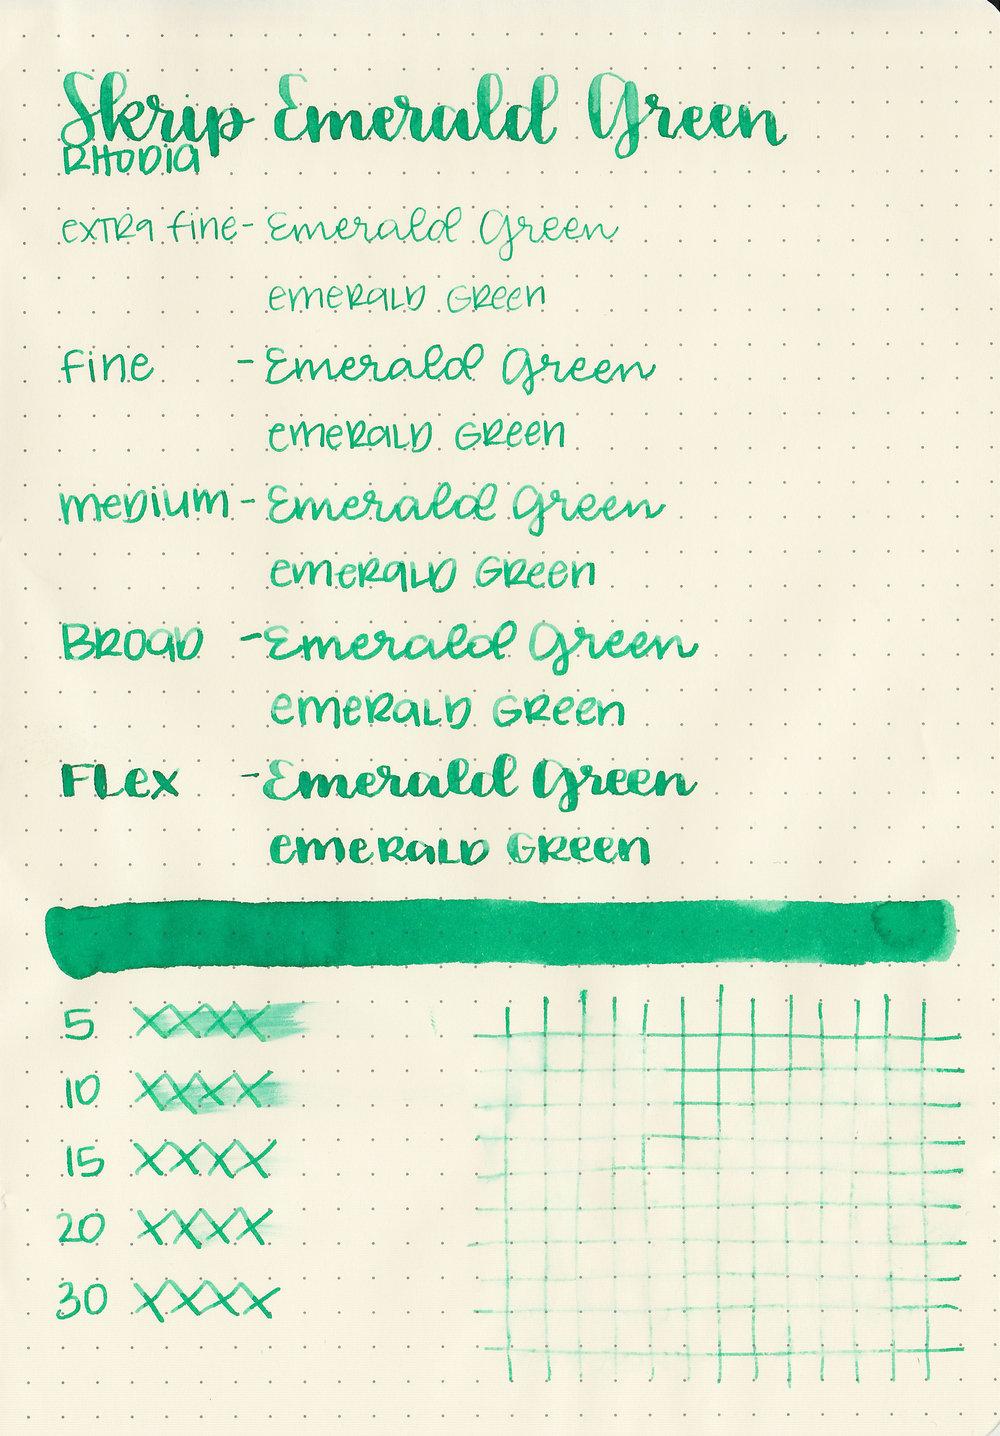 skr-emerald-green-9.jpg